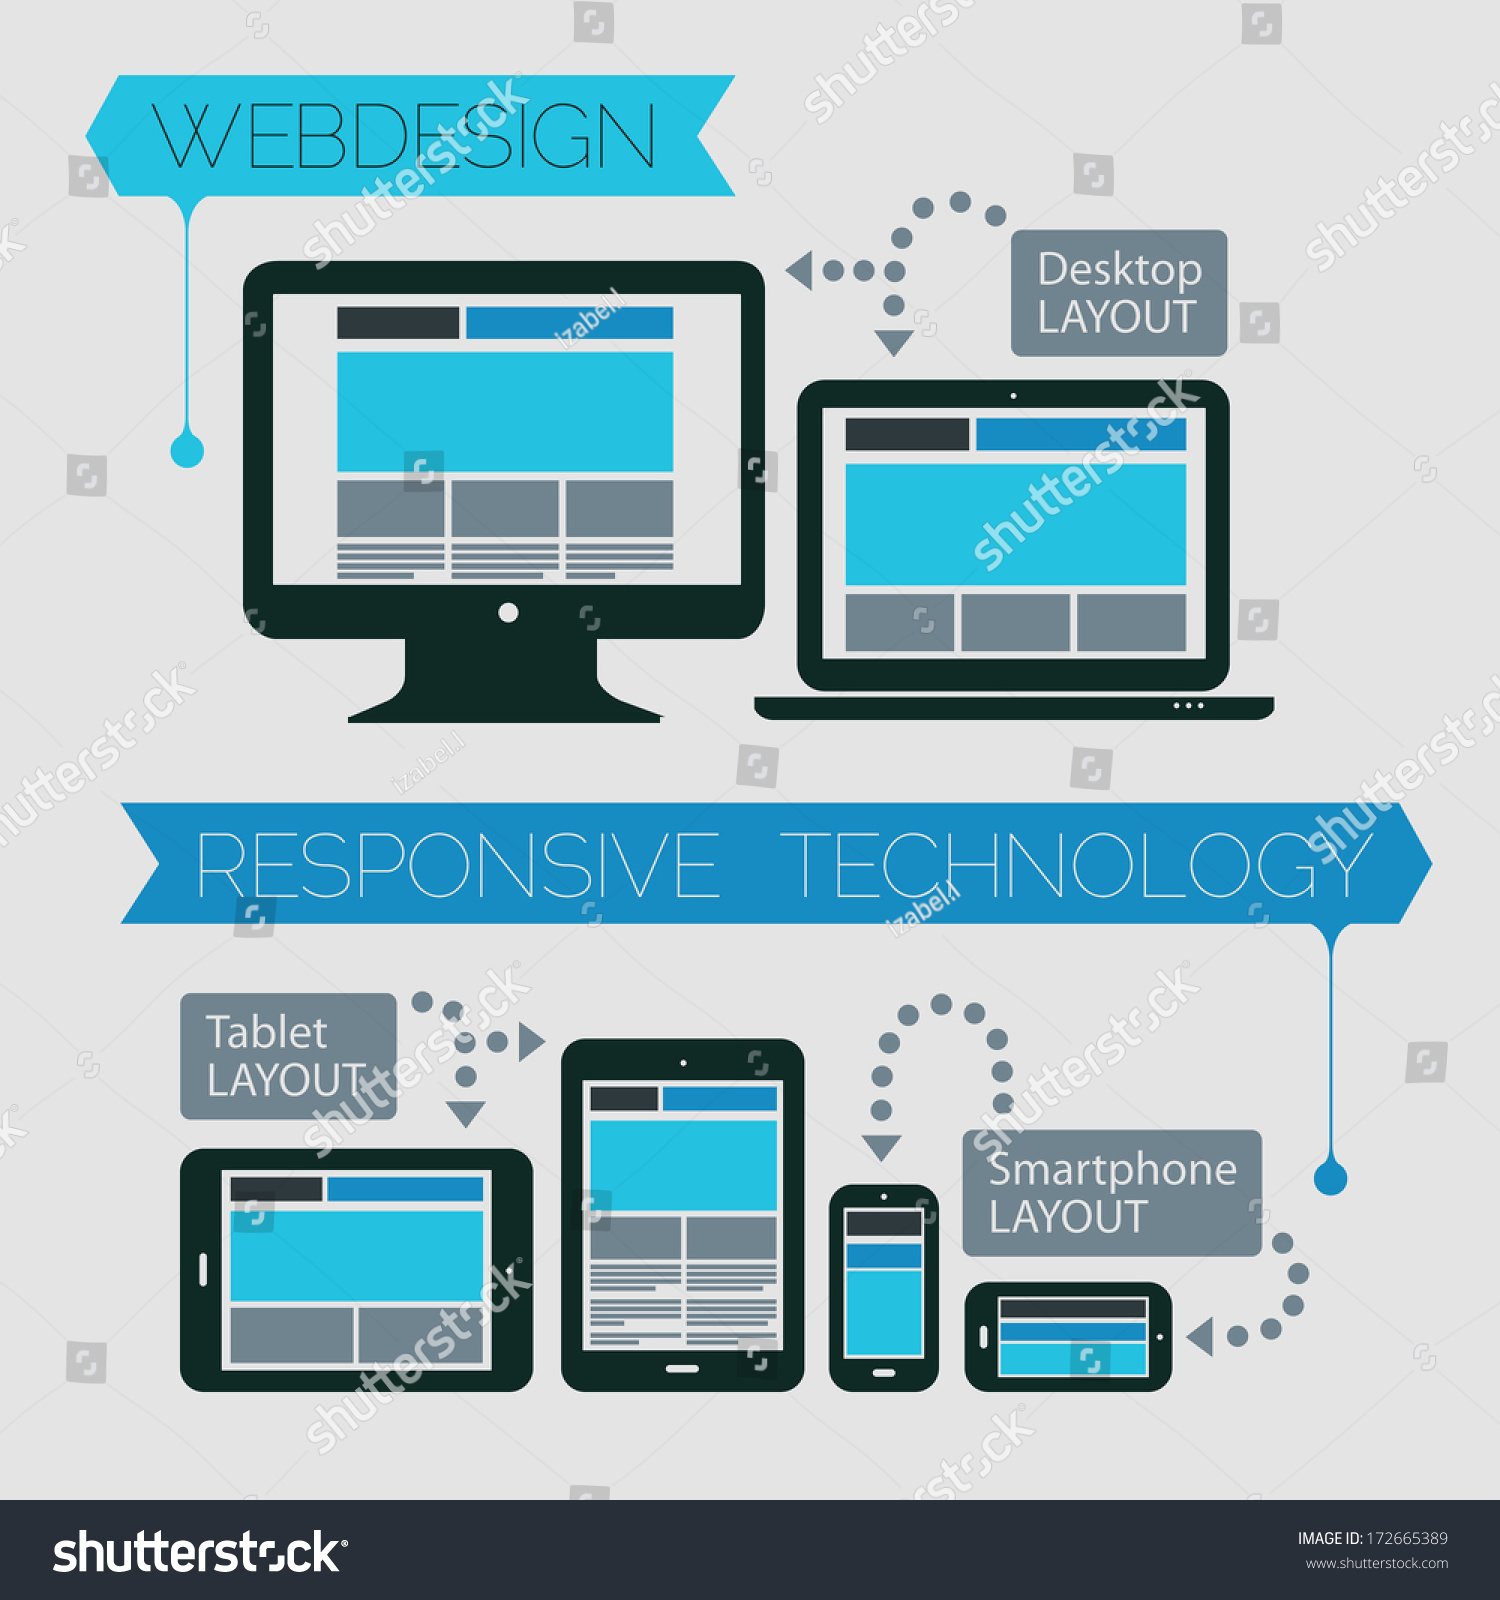 Flat Style Responsive Webdesign Technology Stock Vector